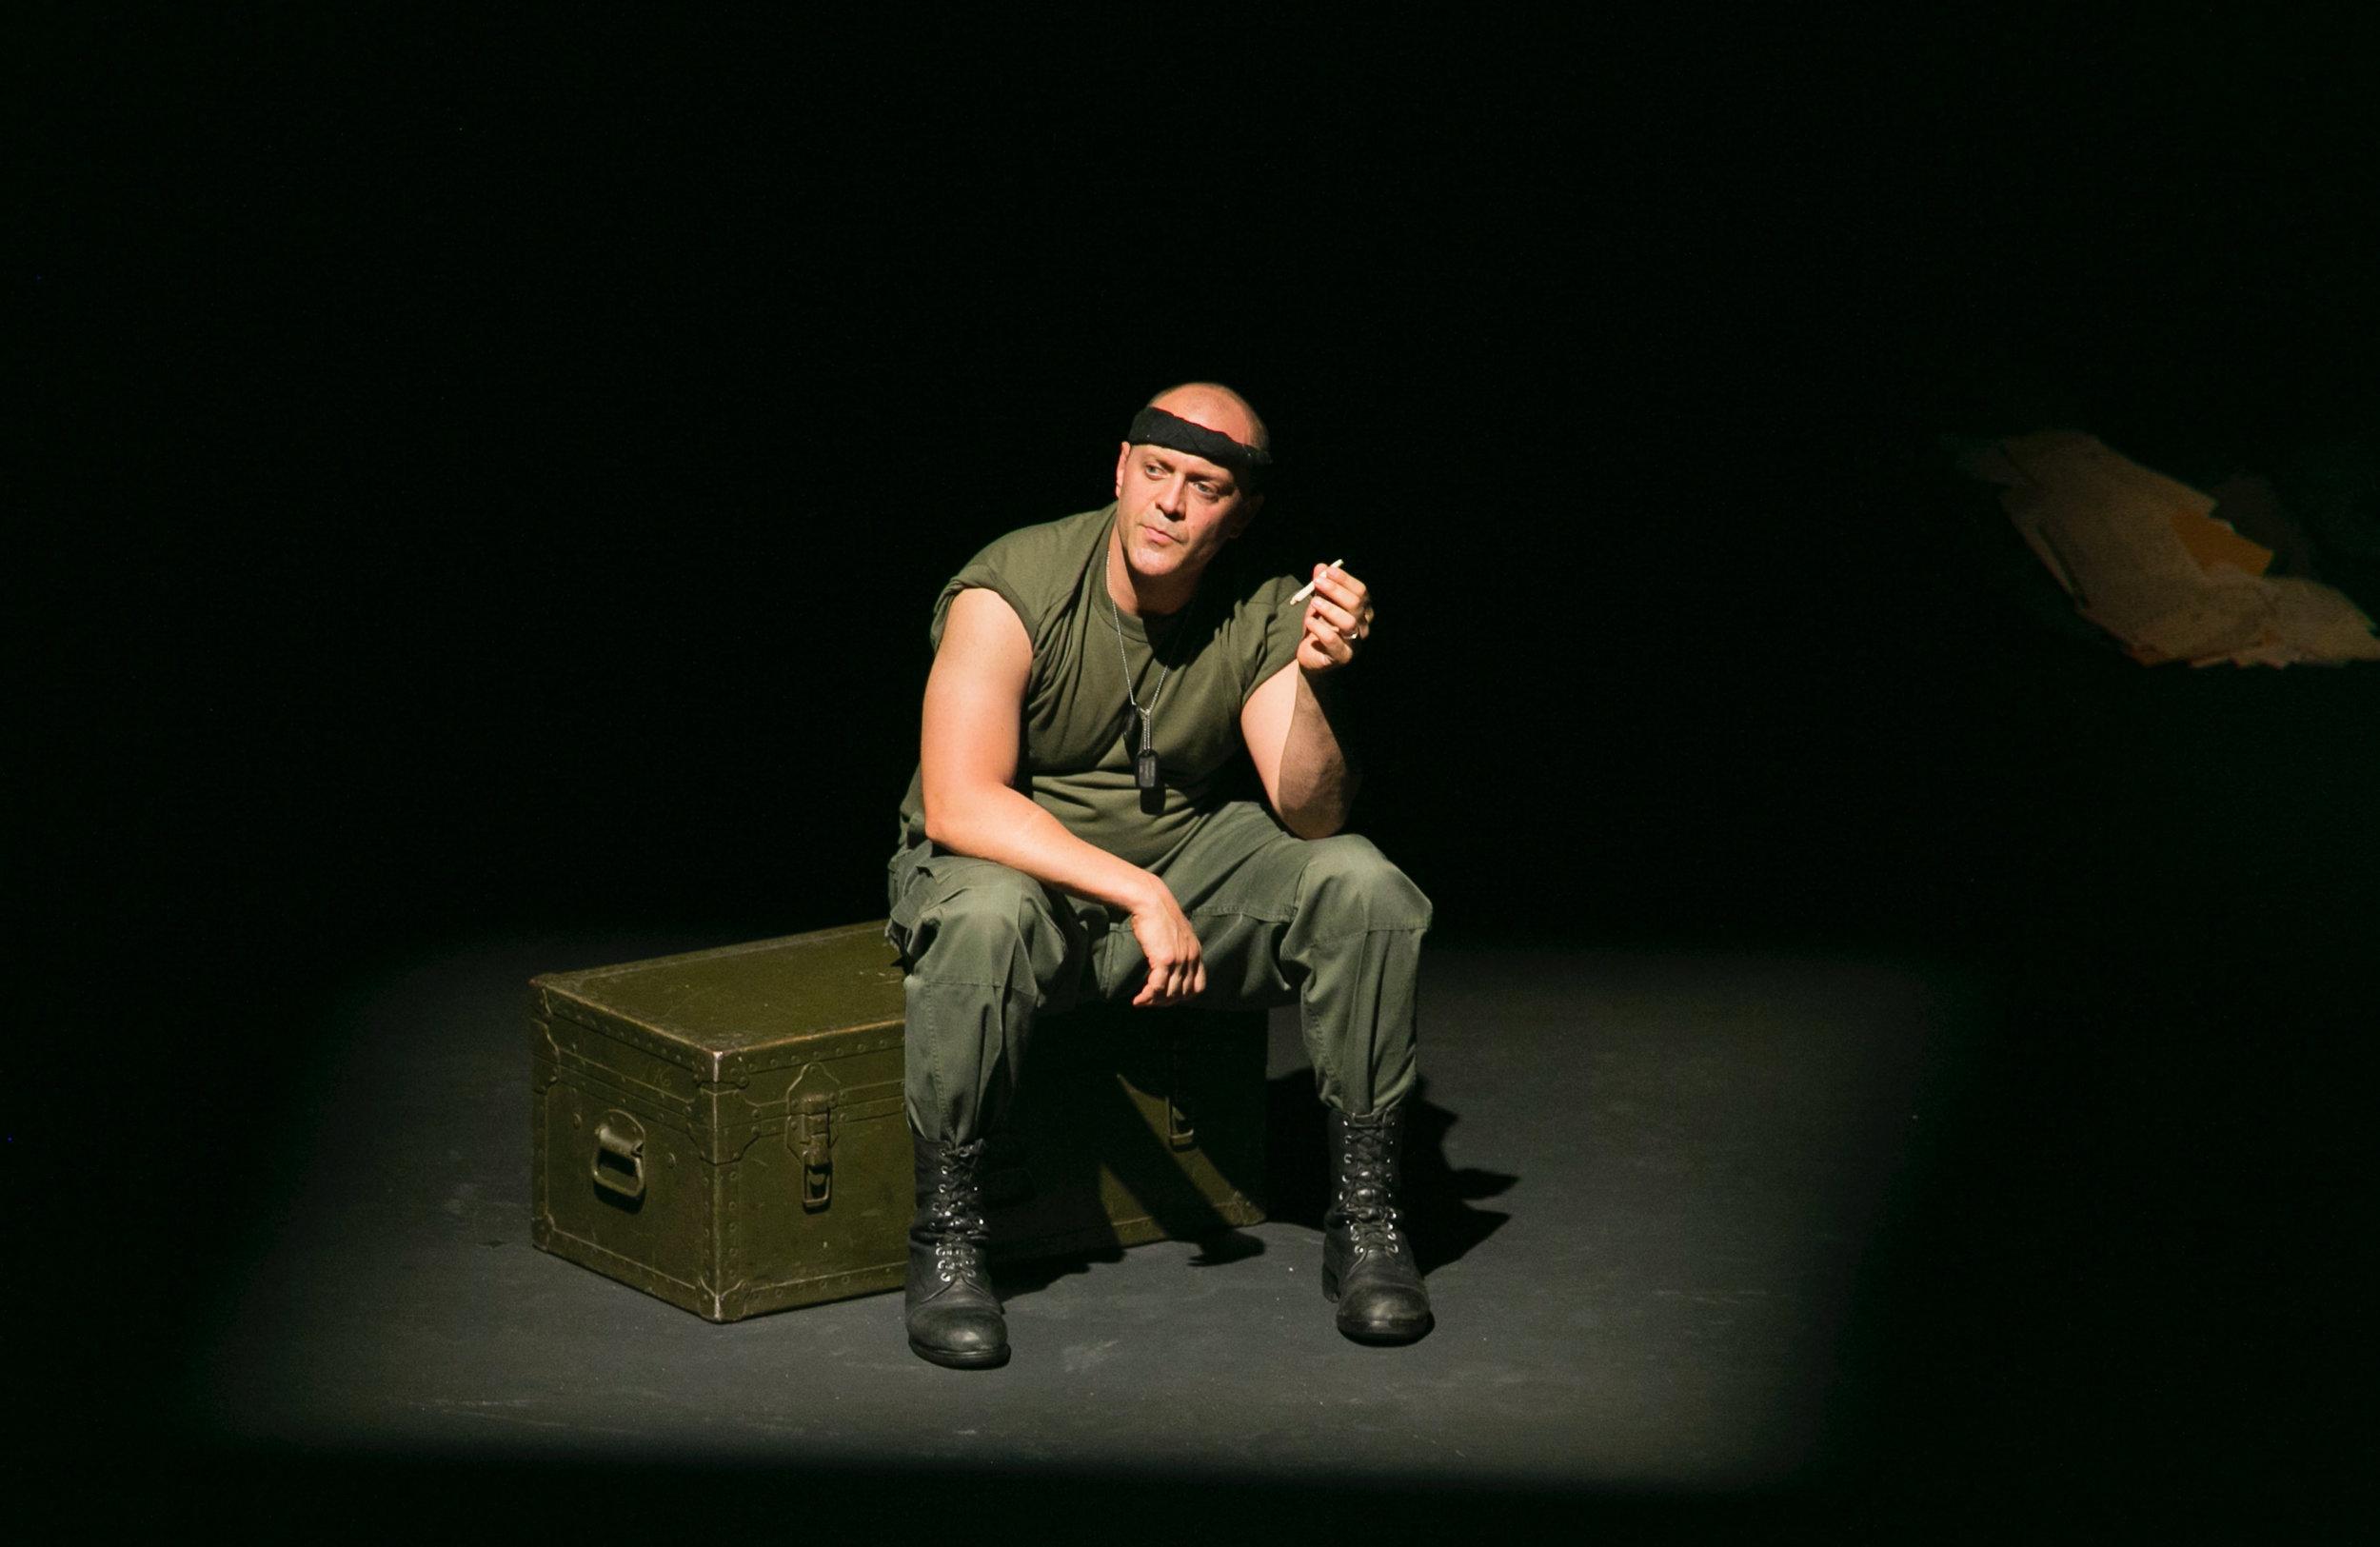 The_American_Soldier_20181005_TColella_HR_22.jpg